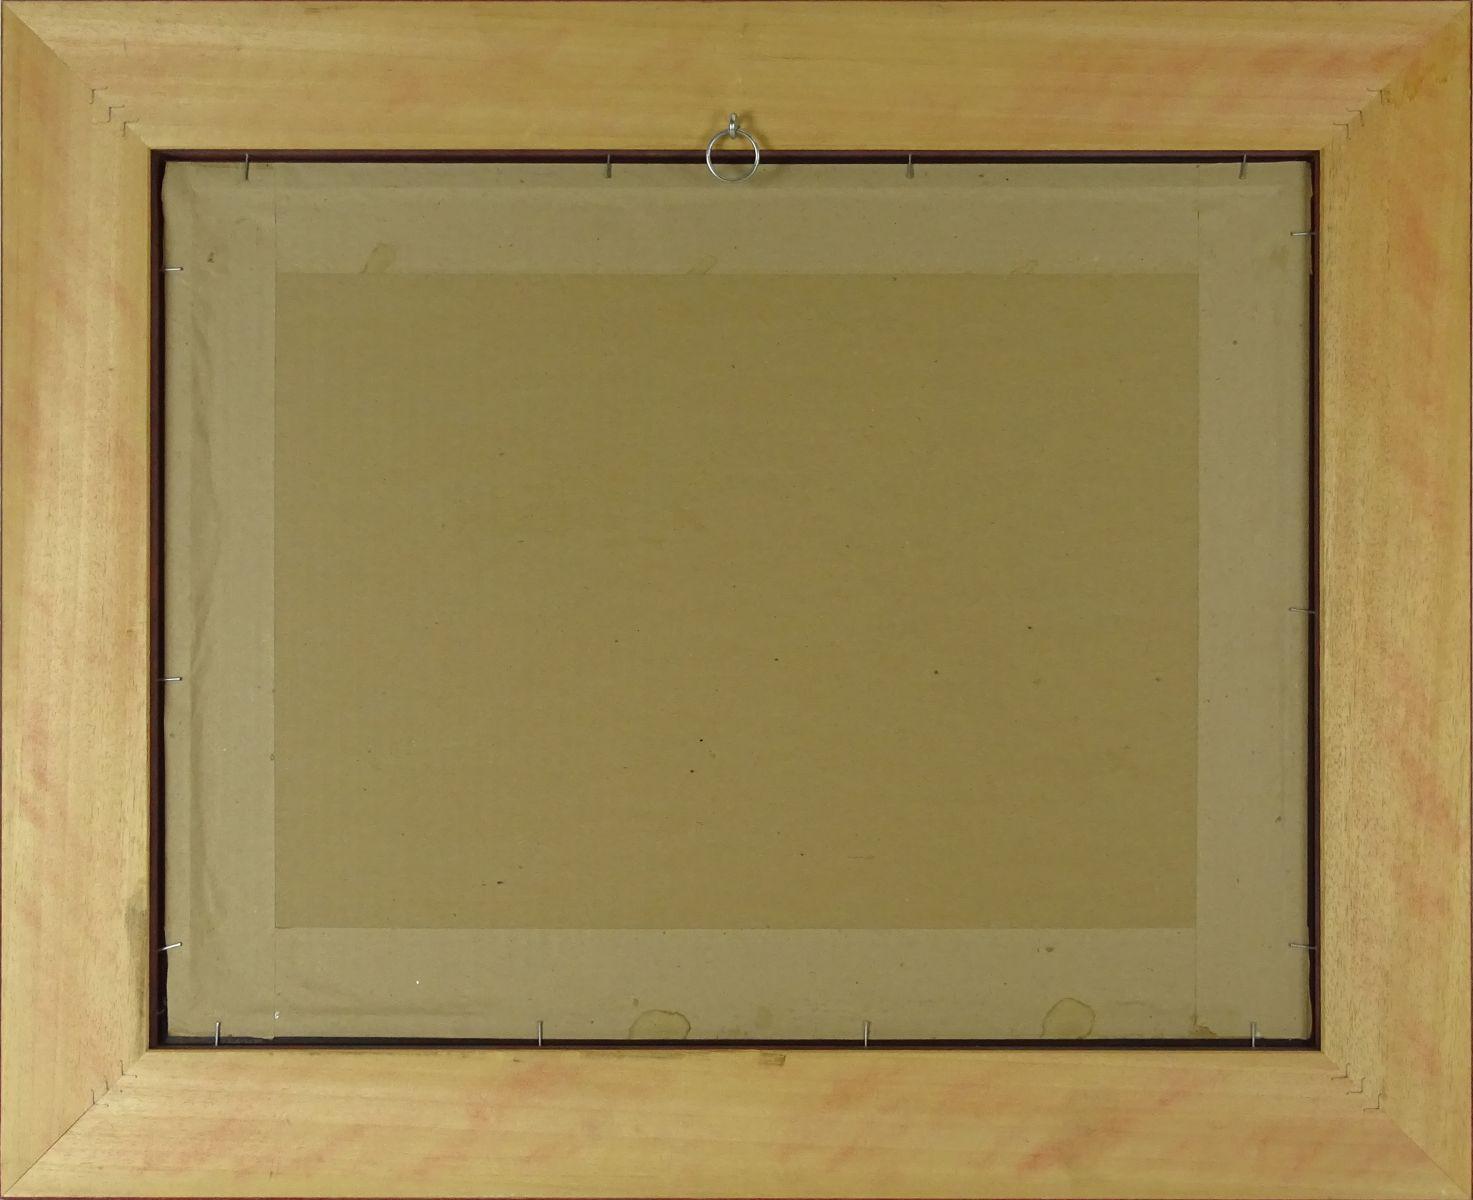 DSC04259.JPG (1473×1200)